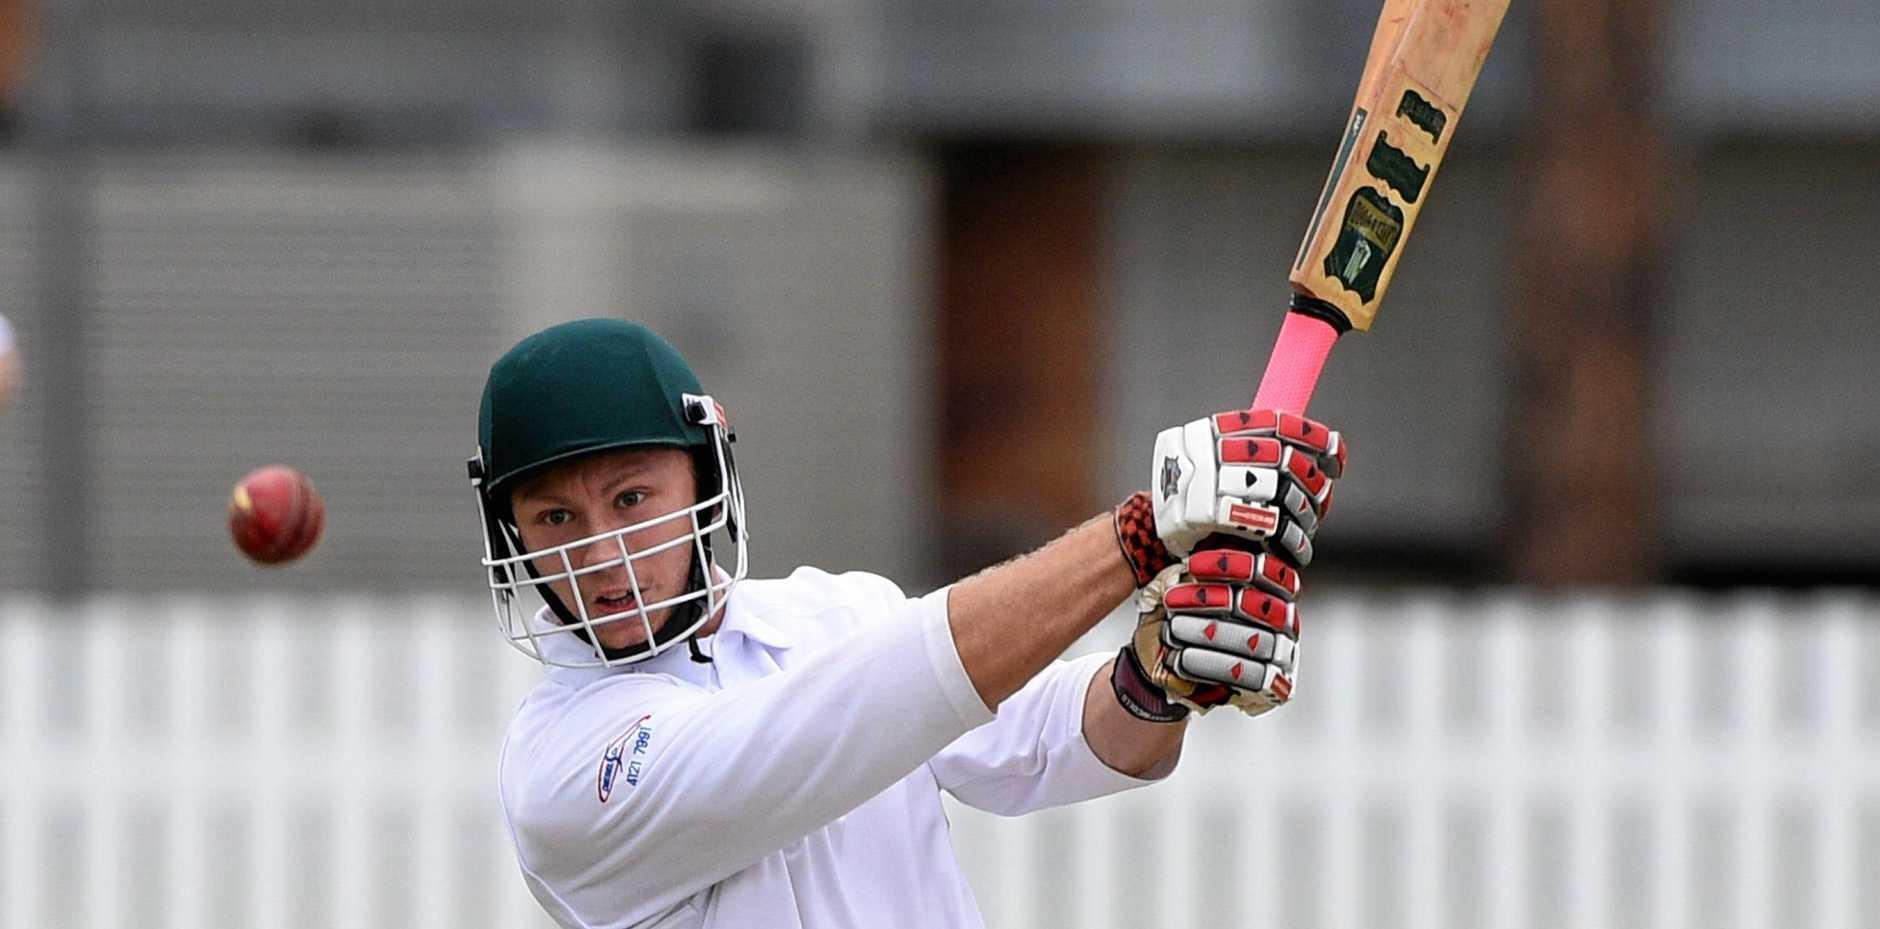 Maryborough cricket - Tinana (batting) v Australs (fielding). Tyler Simpson hits back down the field.